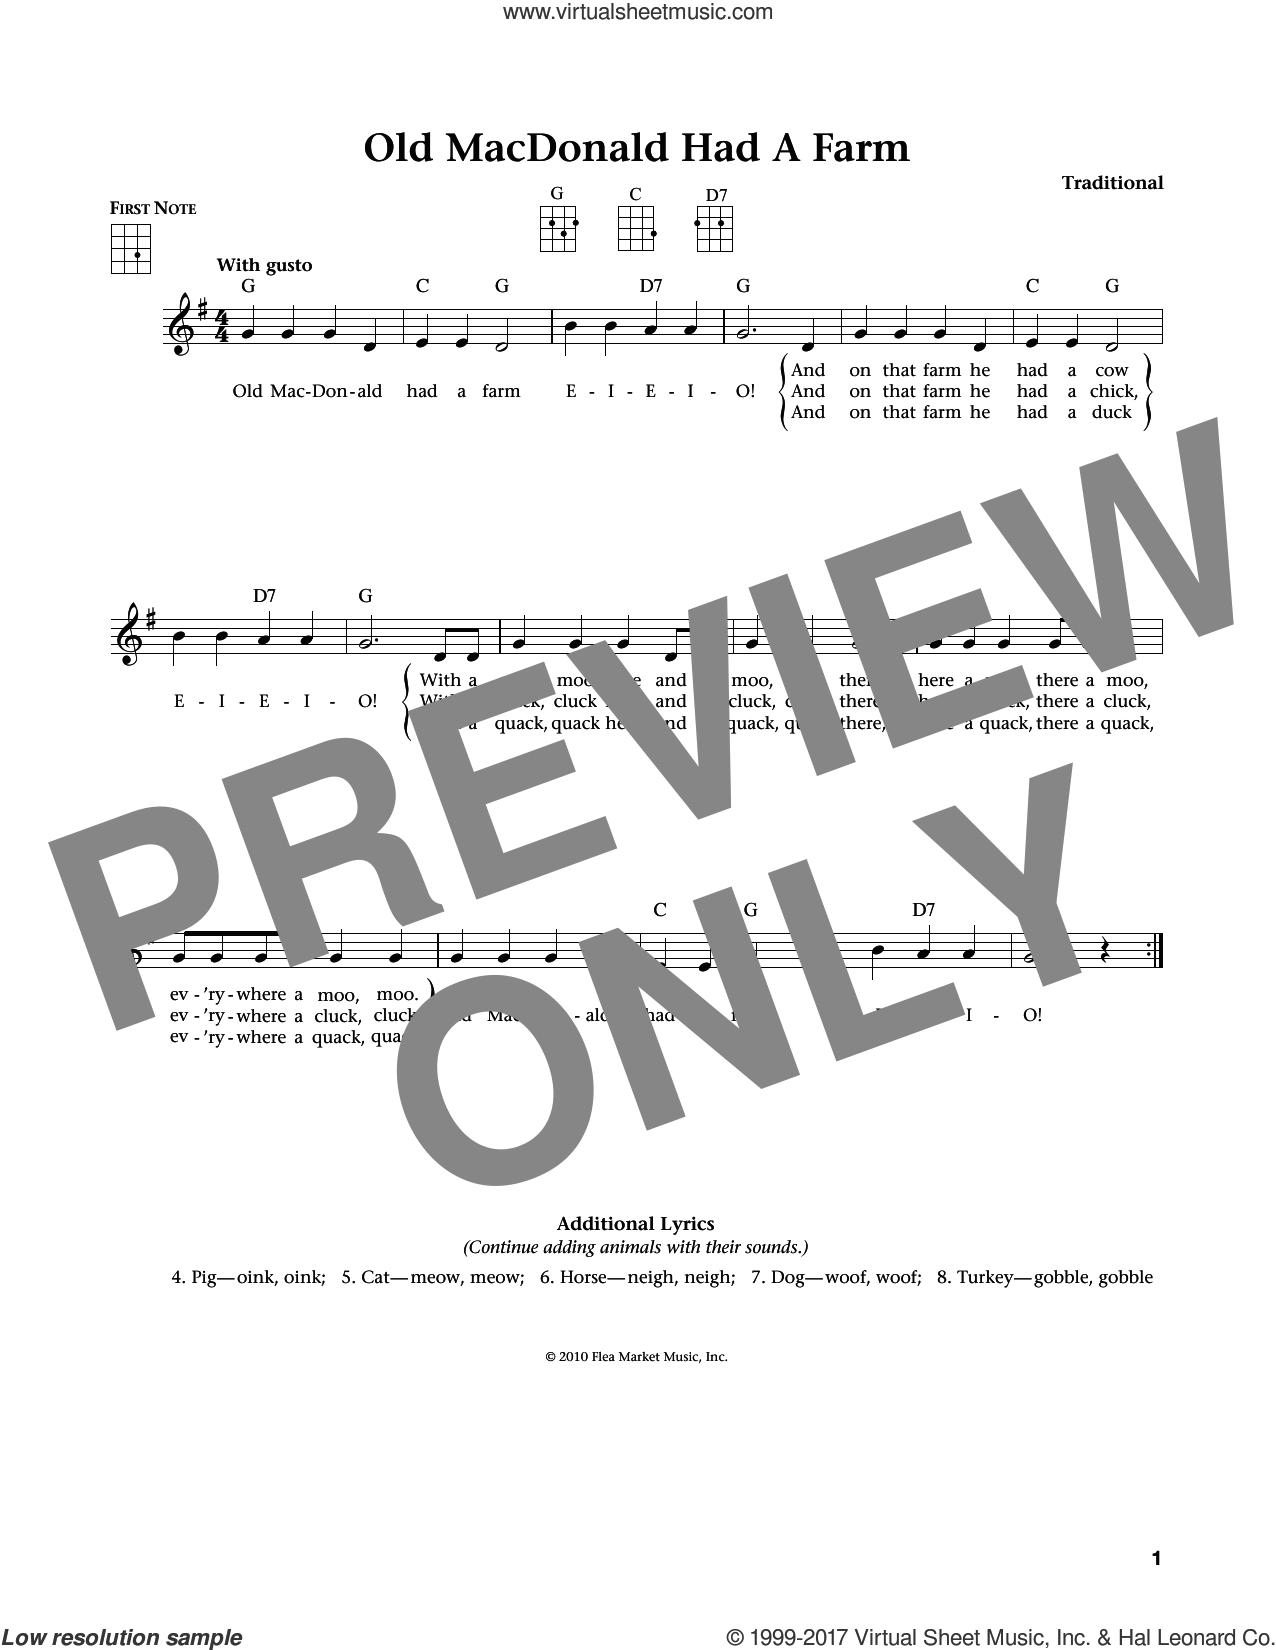 Old Macdonald Had A Farm (from The Daily Ukulele) (arr. Liz and Jim Beloff) sheet music for ukulele , Jim Beloff and Liz Beloff, intermediate skill level